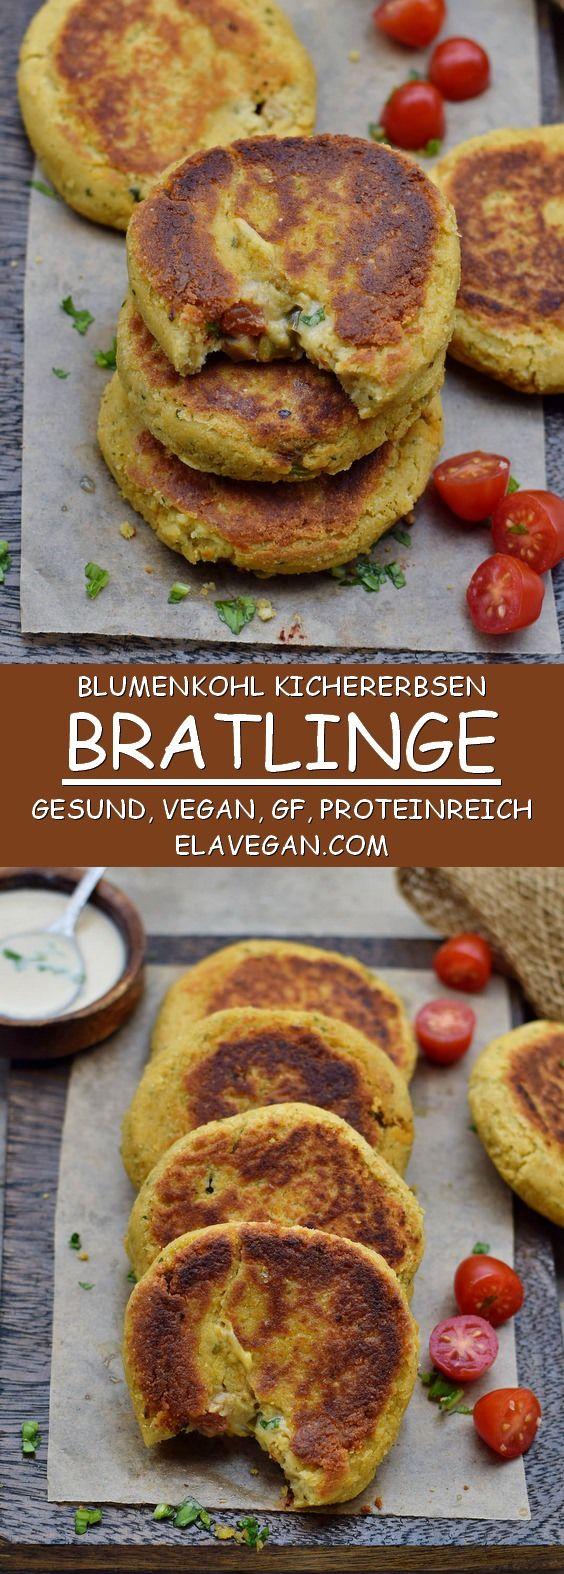 Photo of Vegan patties with cauliflower simple recipe – Elavegan